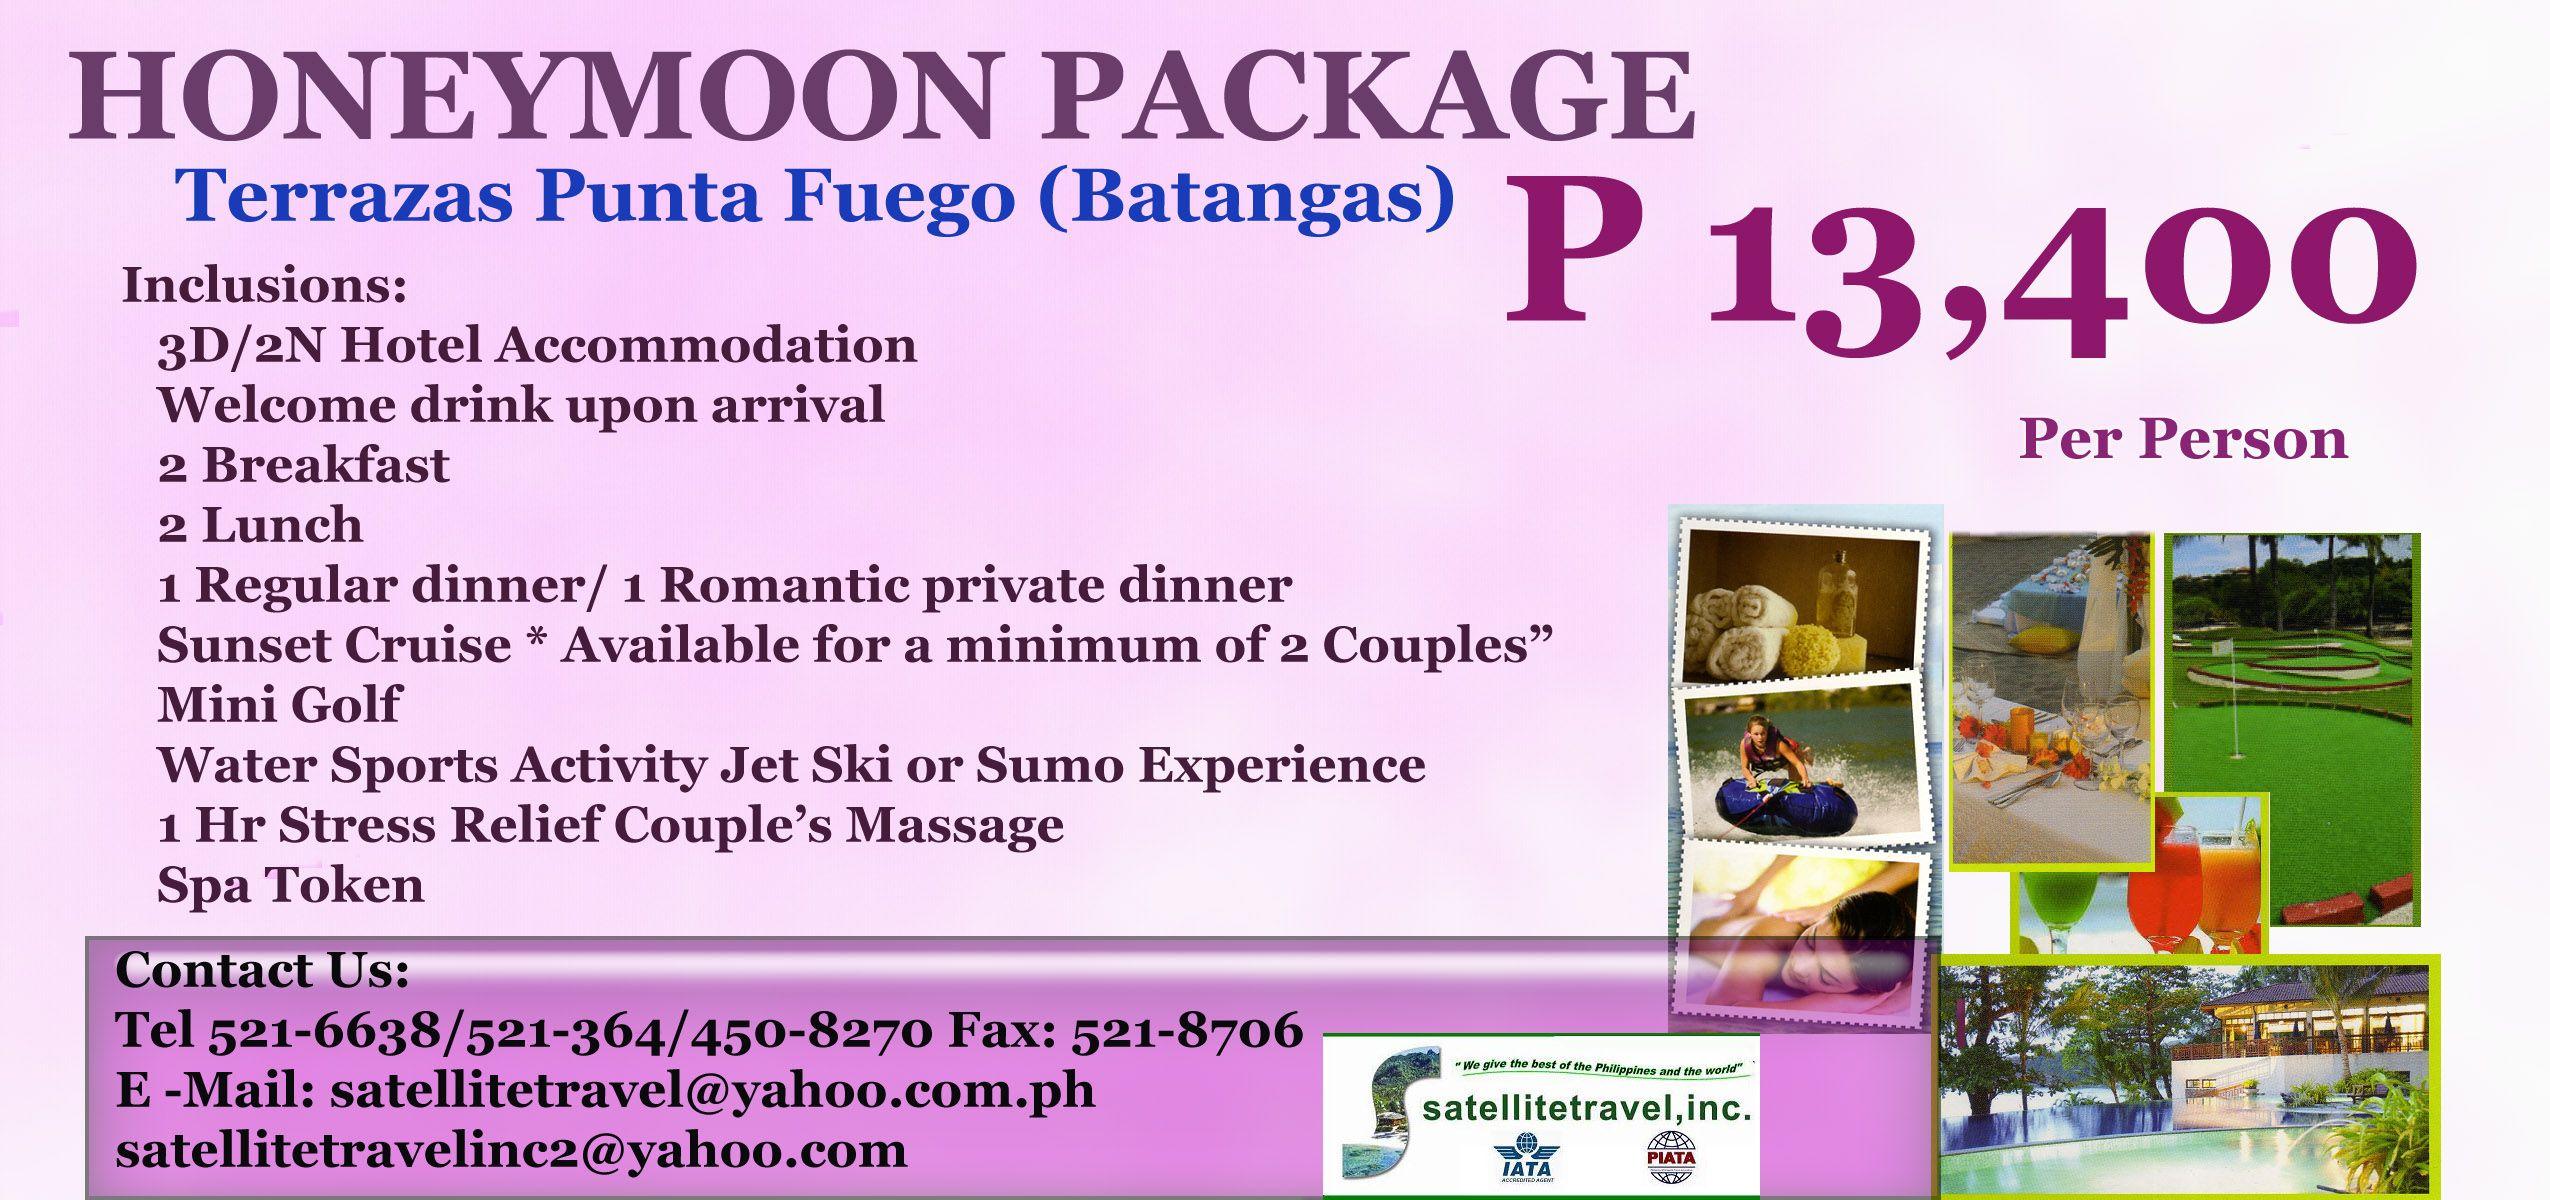 Honeymoon Package Terrazas Punta Fuego Batangas November 2012 Honeymoon Packages Honeymoon Packaging